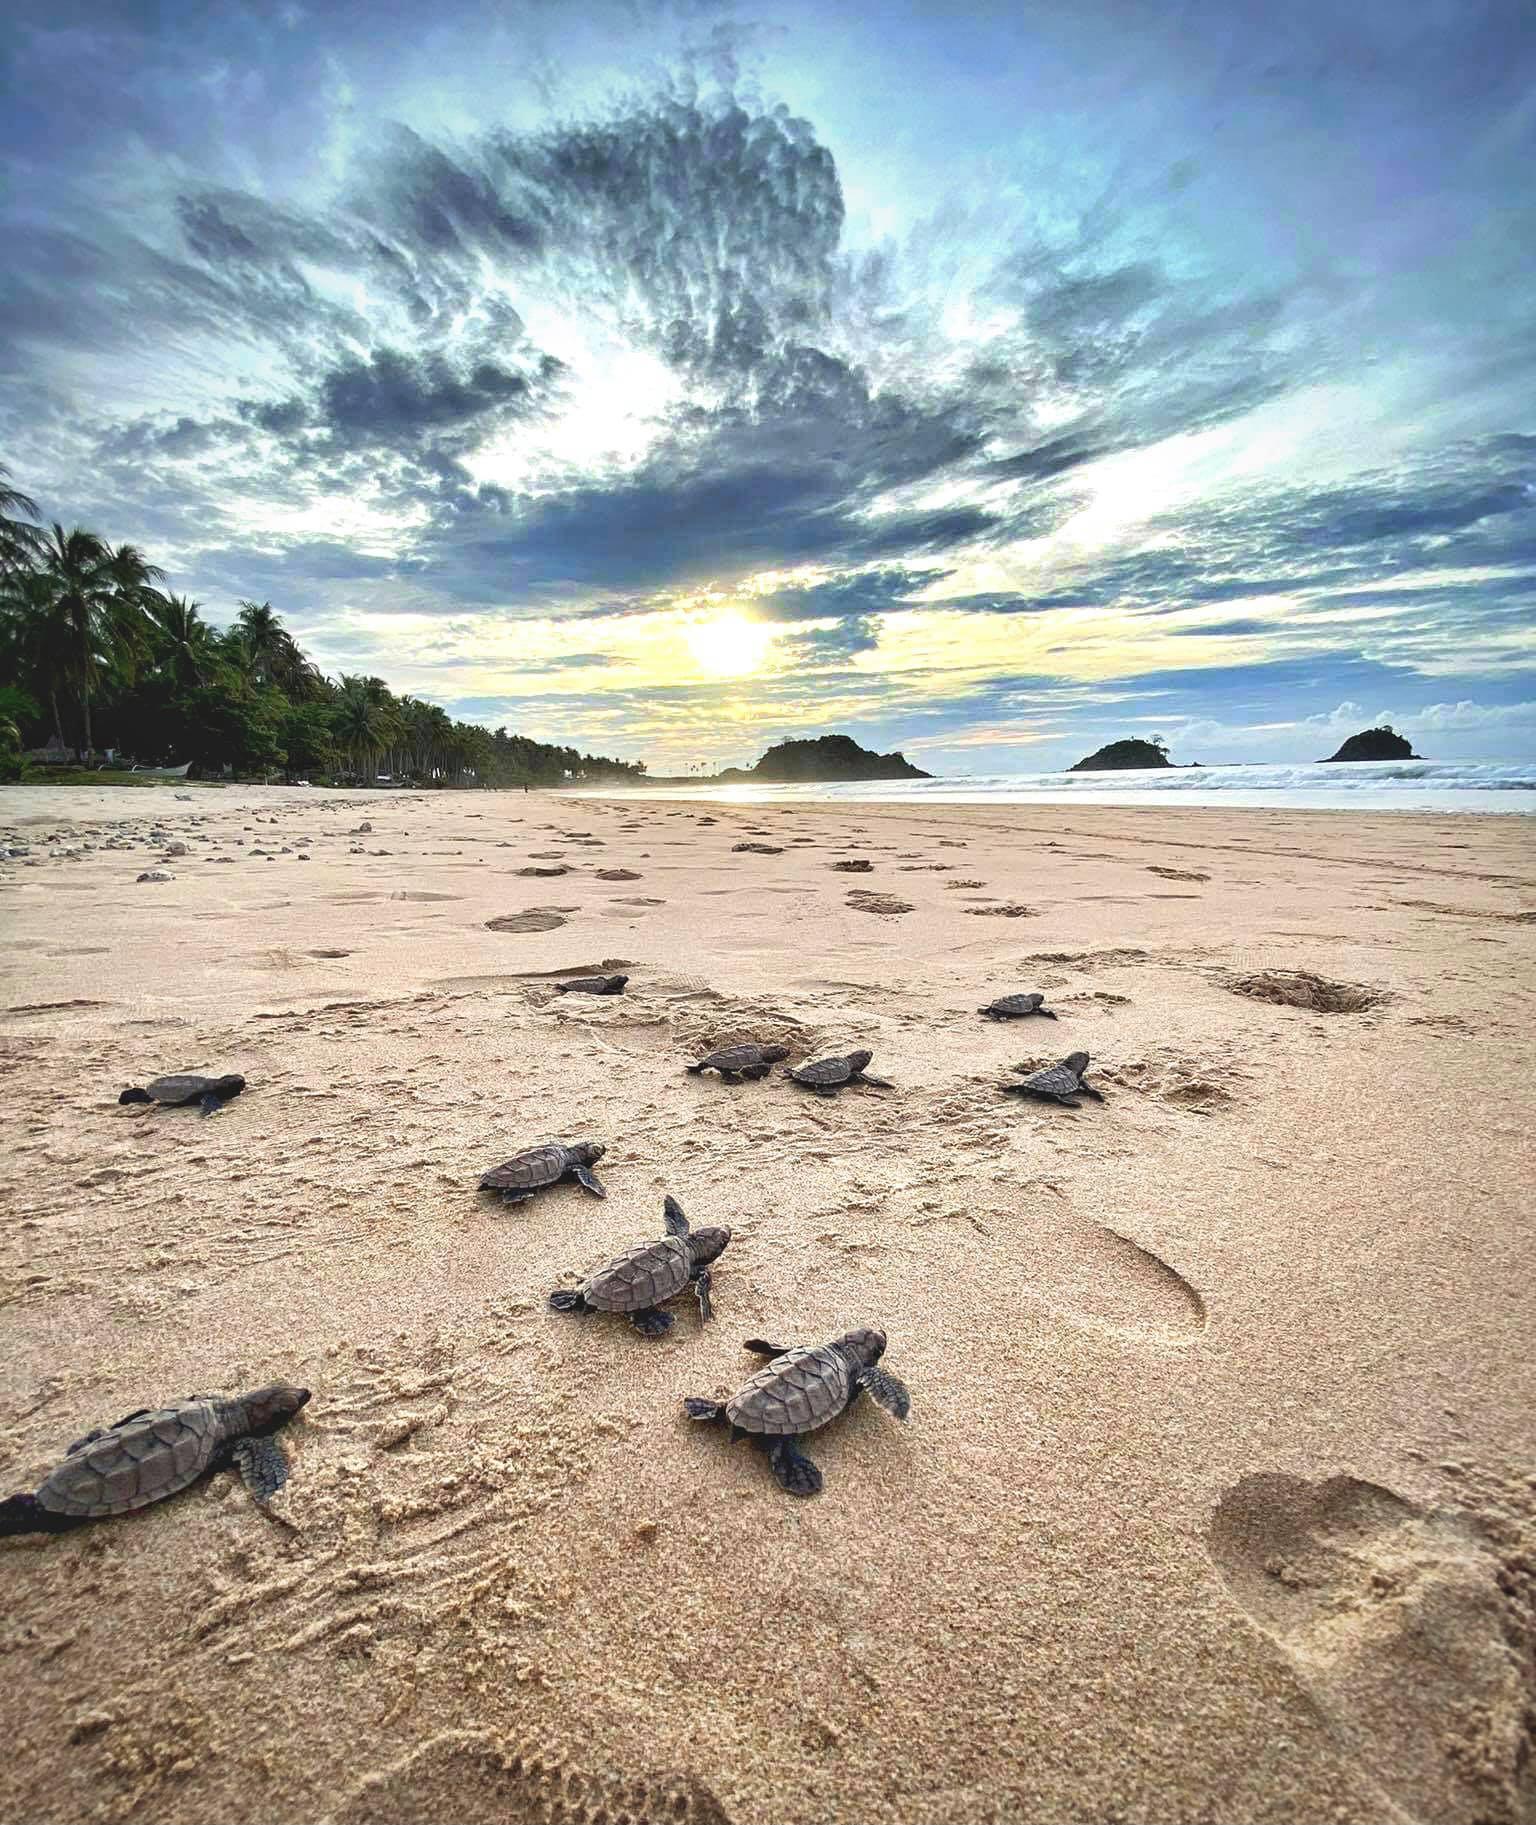 Nacpan沙灘驚見遍地海龜